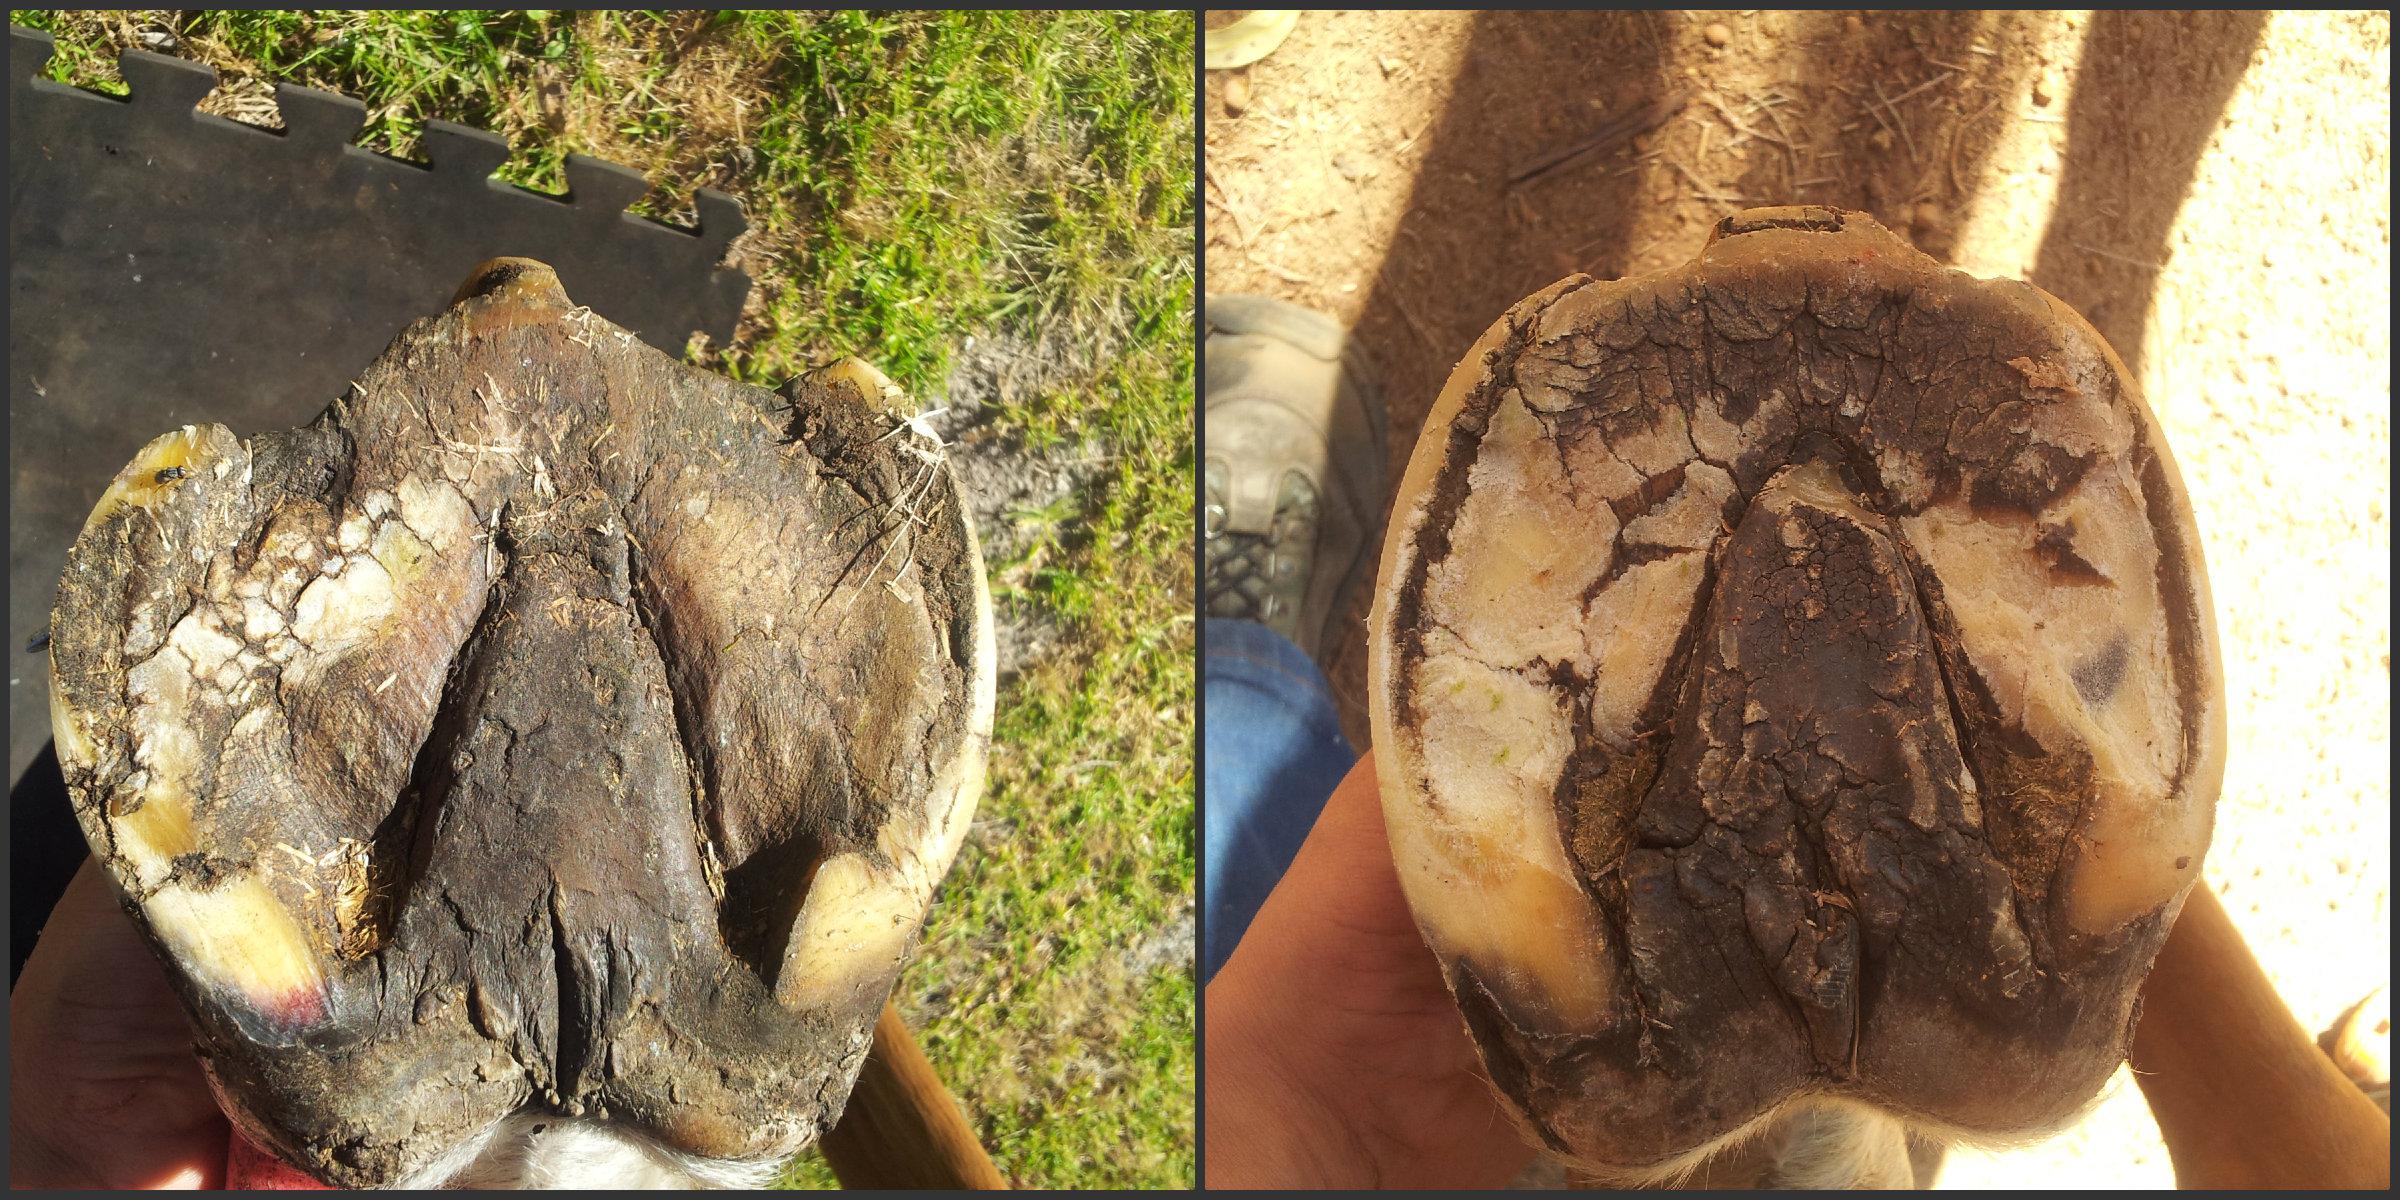 Seedy toe/ Subsolar abscess